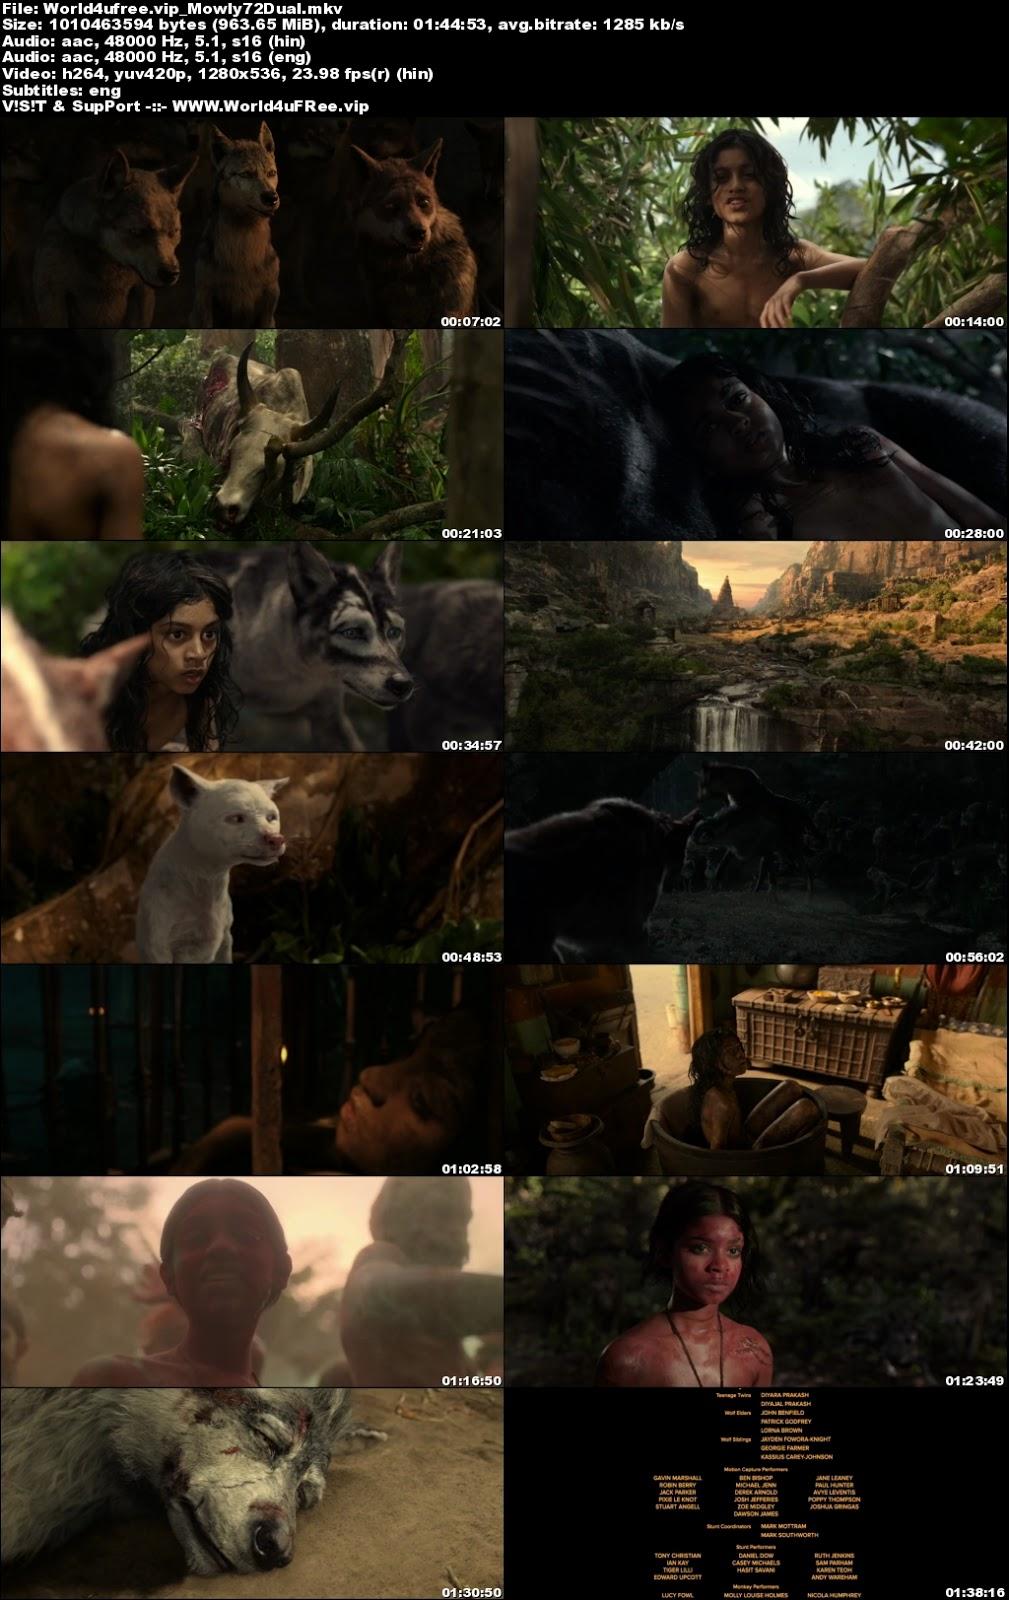 Mowgli Legend of the Jungle 2018 Dual Audio 720p HDRip 950Mb x264 world4ufree.vip, hollywood movie Mowgli Legend of the Jungle 2018 hindi dubbed dual audio hindi english languages original audio 720p BRRip hdrip free download 700mb movies download or watch online at world4ufree.vip